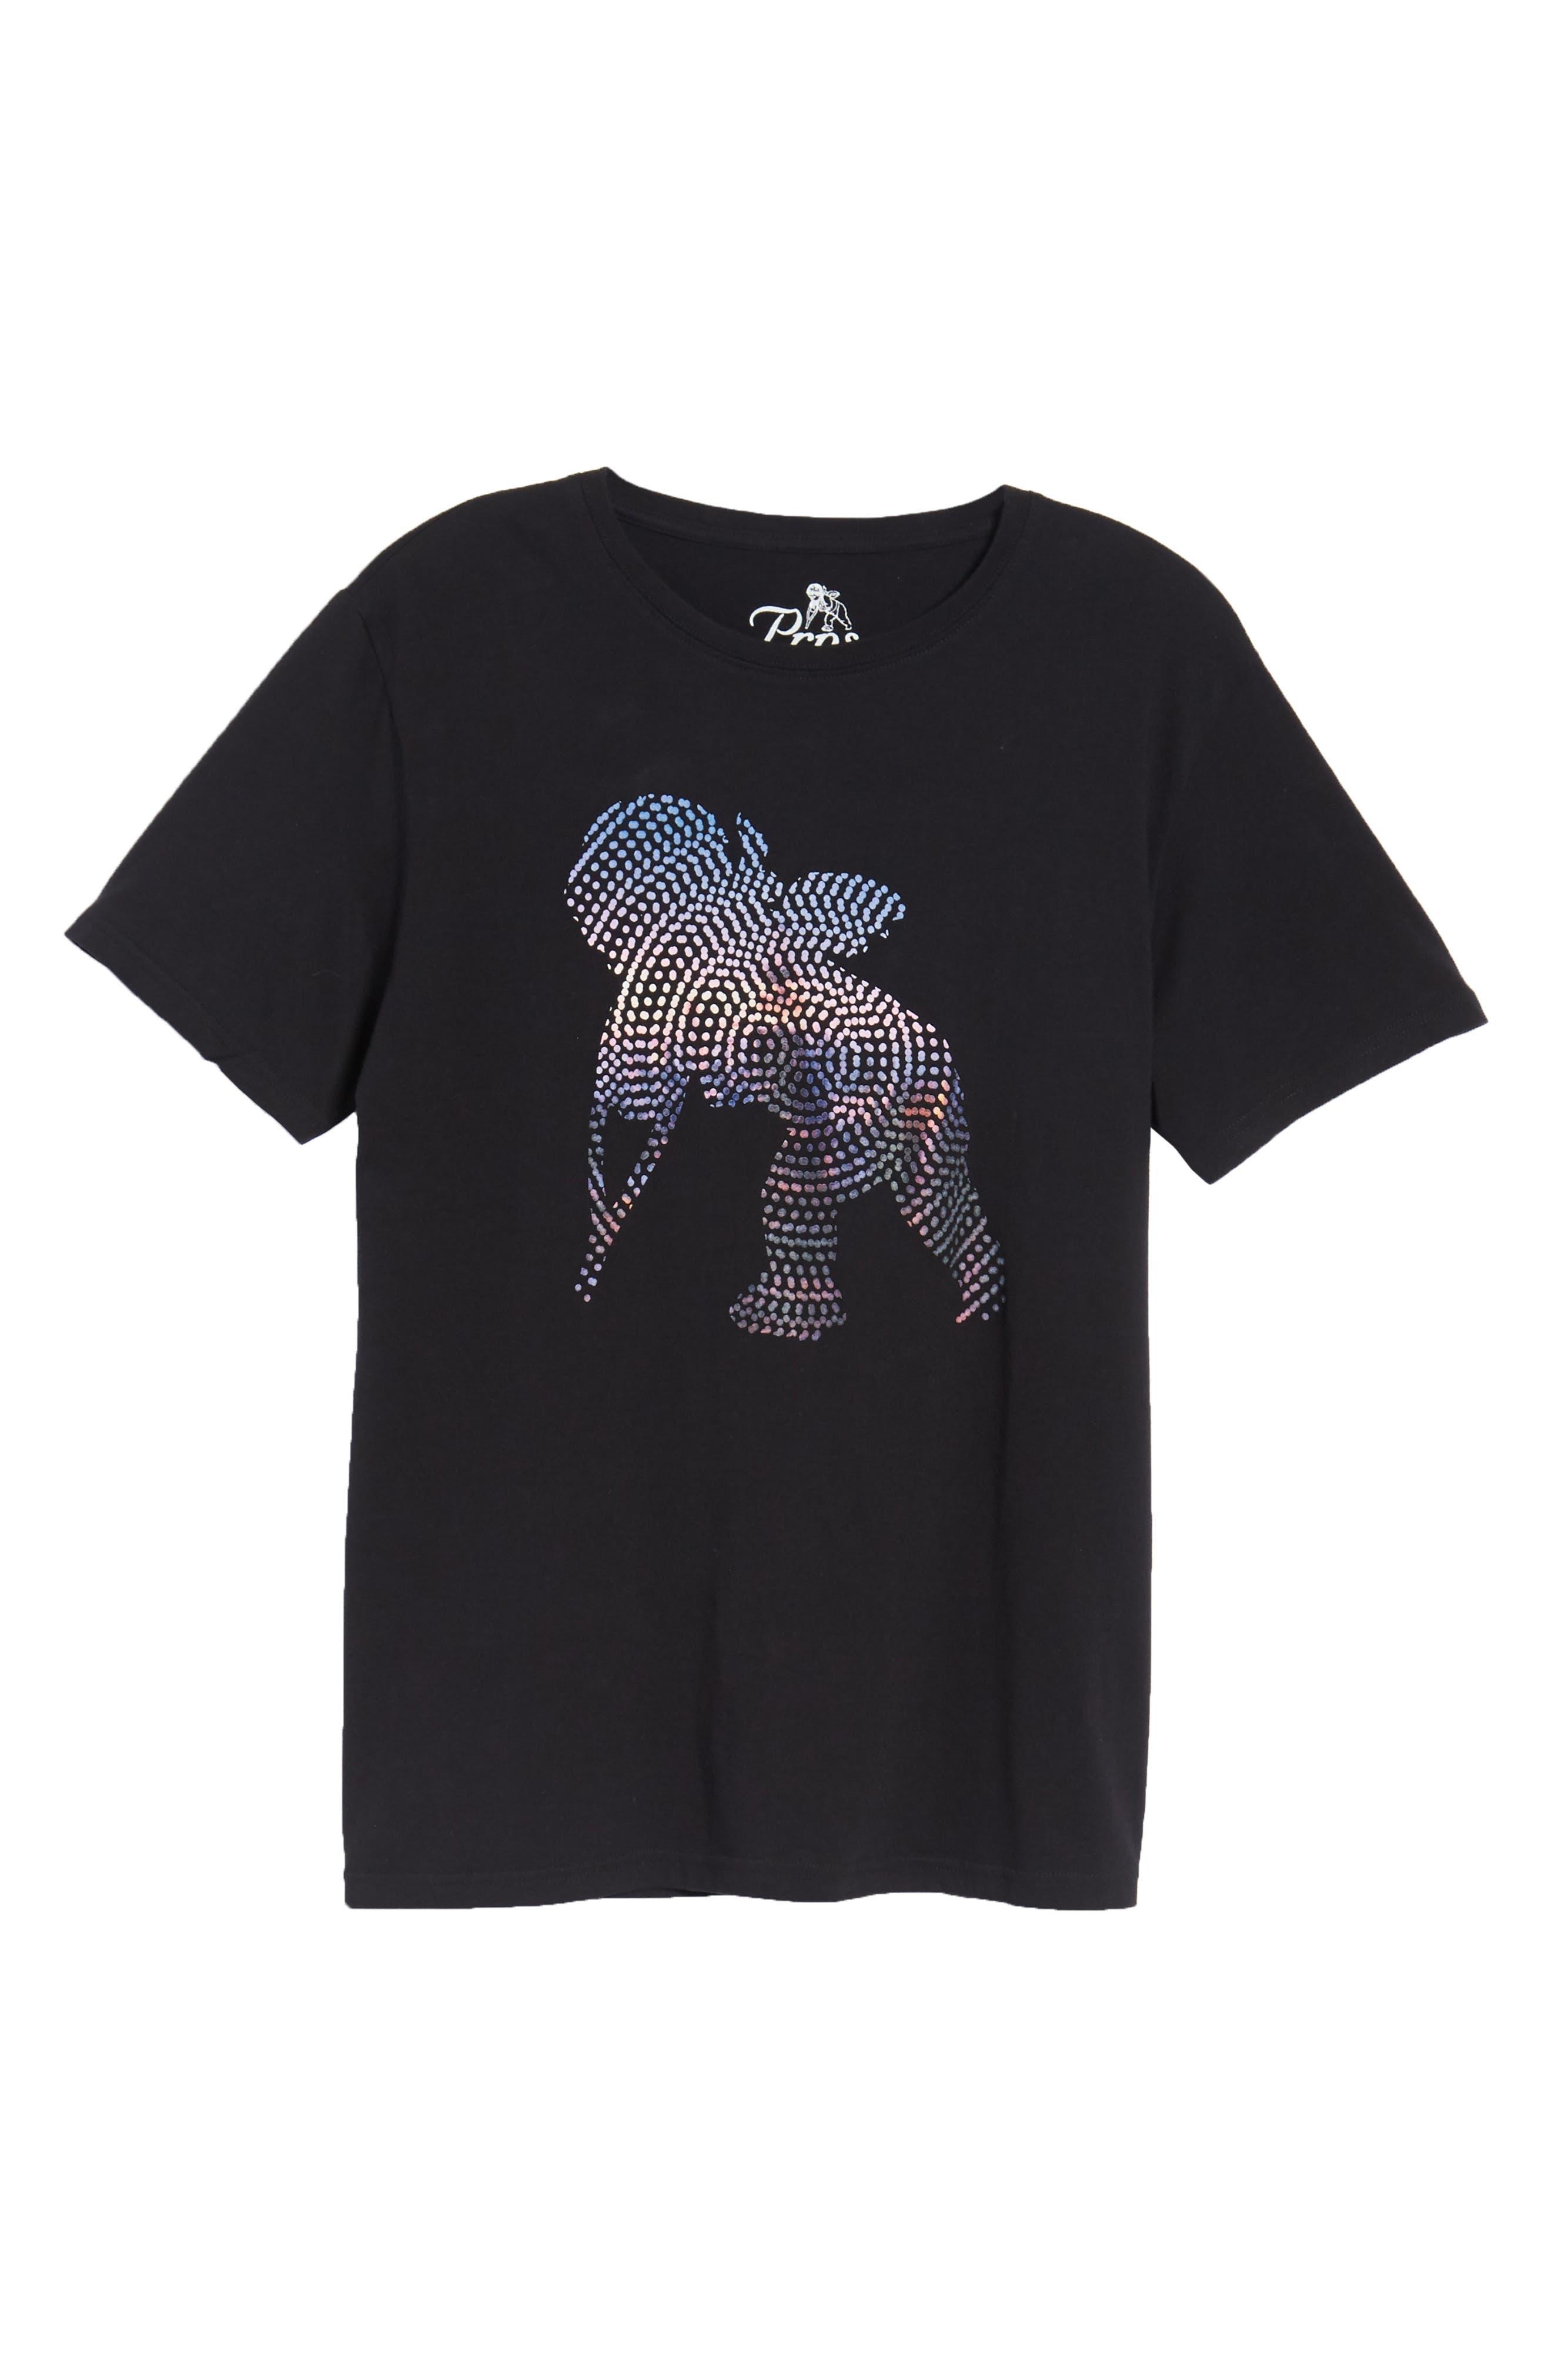 Cherub Graphic T-Shirt,                             Alternate thumbnail 6, color,                             001